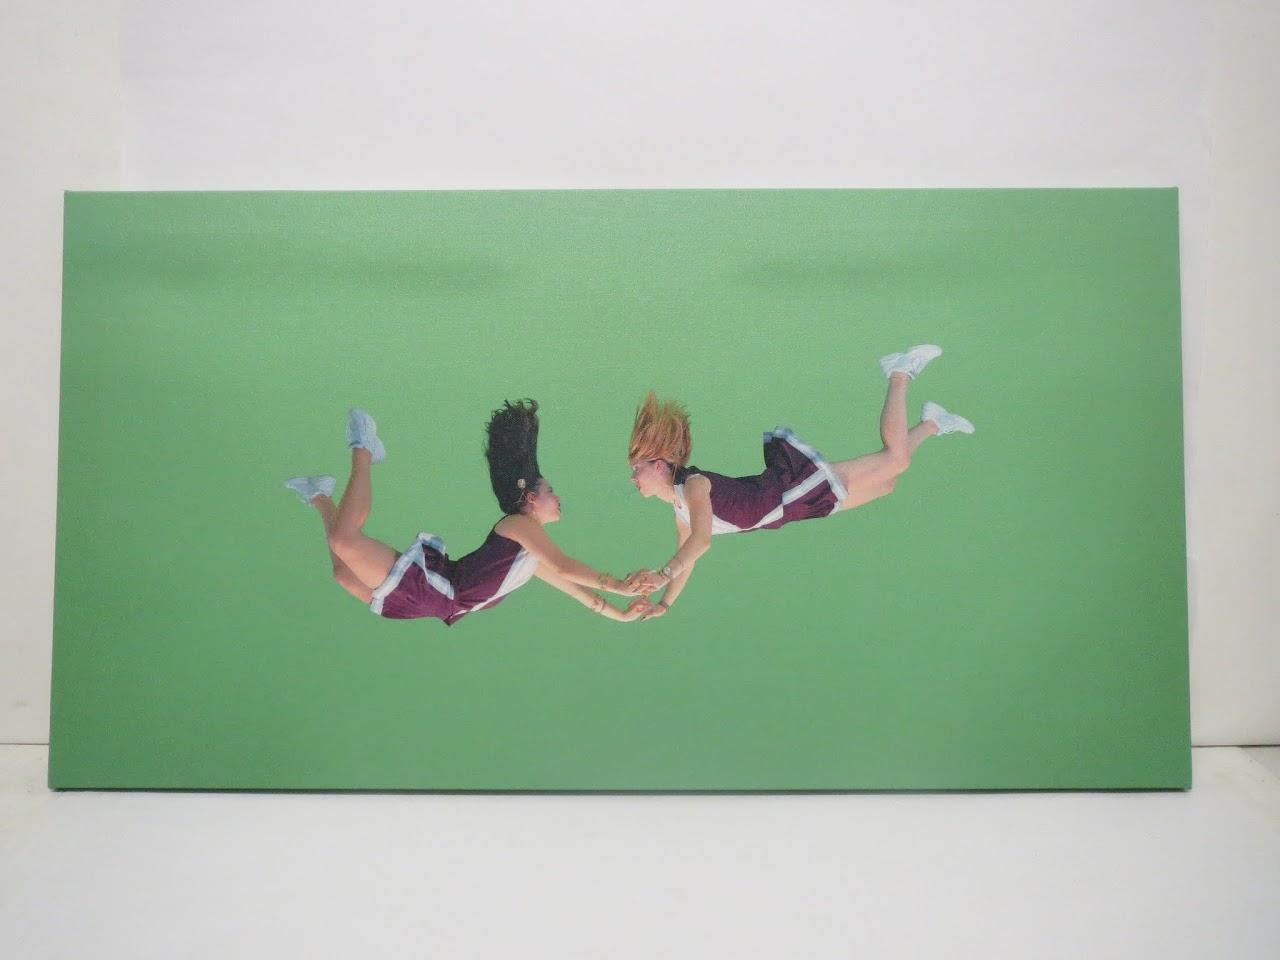 'Untitled(Fluid Exchange)' by Luis Gilpert